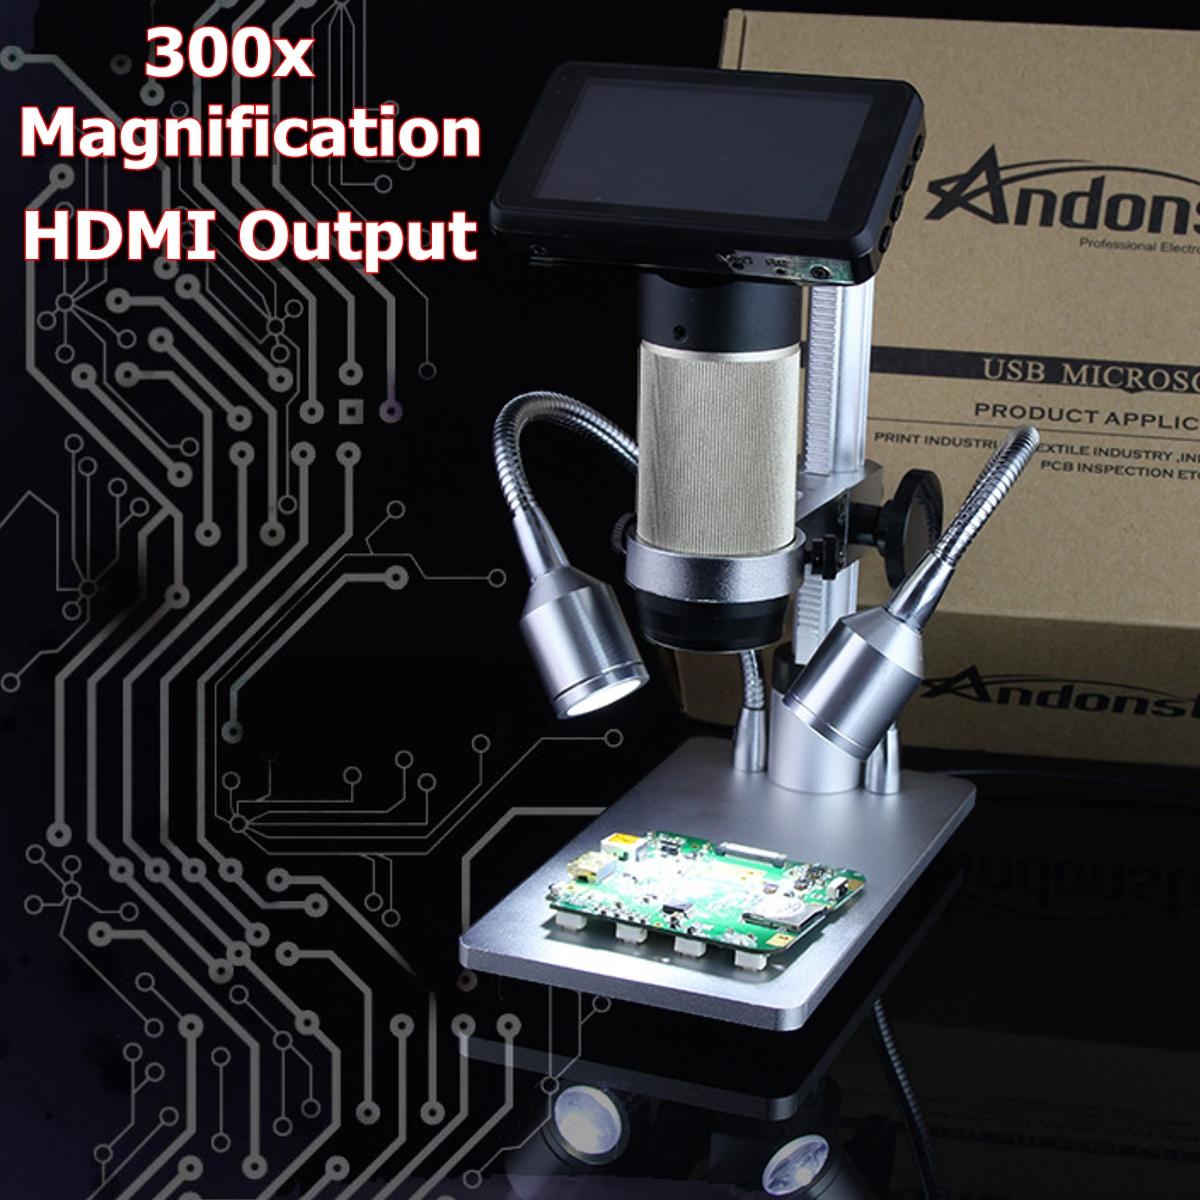 10X-300X Digital Inspection Microscope PCB Repair HDMI USB Full HD 3.0MP Camera